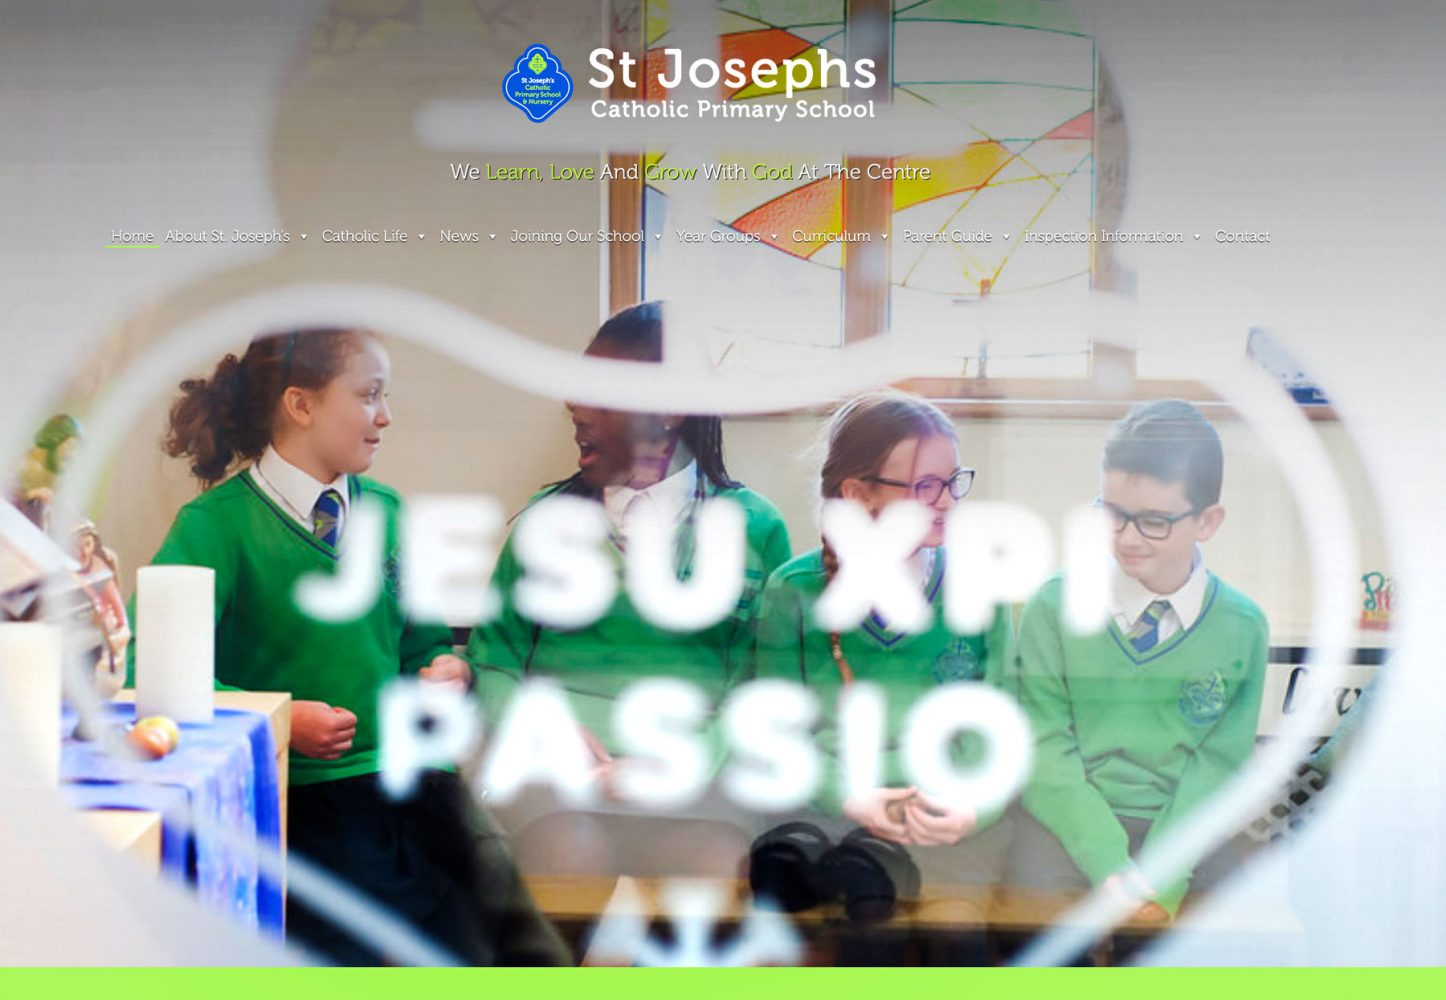 St Josephs primary school website screen image